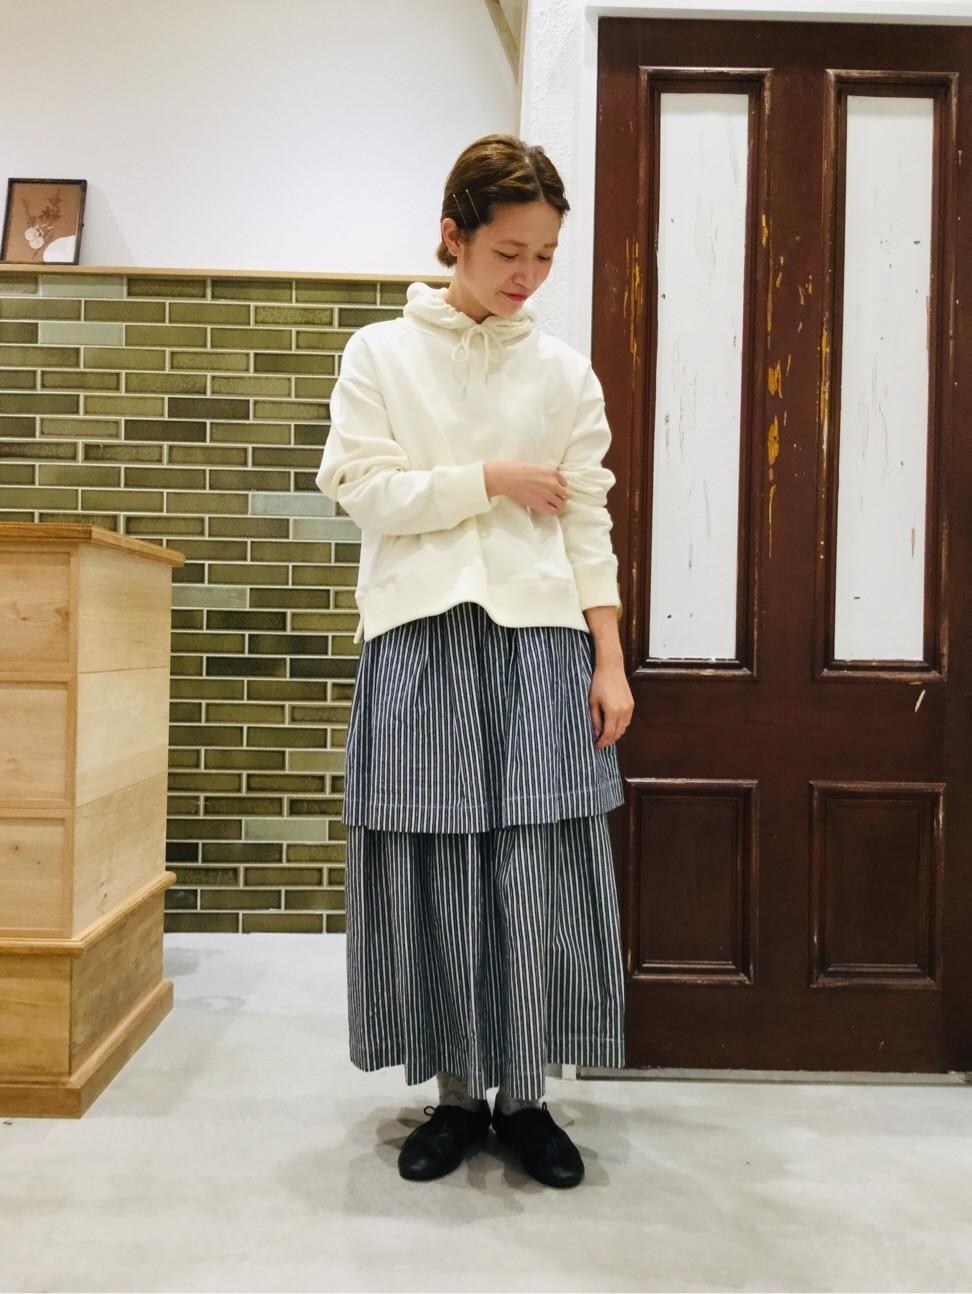 chambre de charme 横浜ジョイナス 身長:160cm 2020.09.21